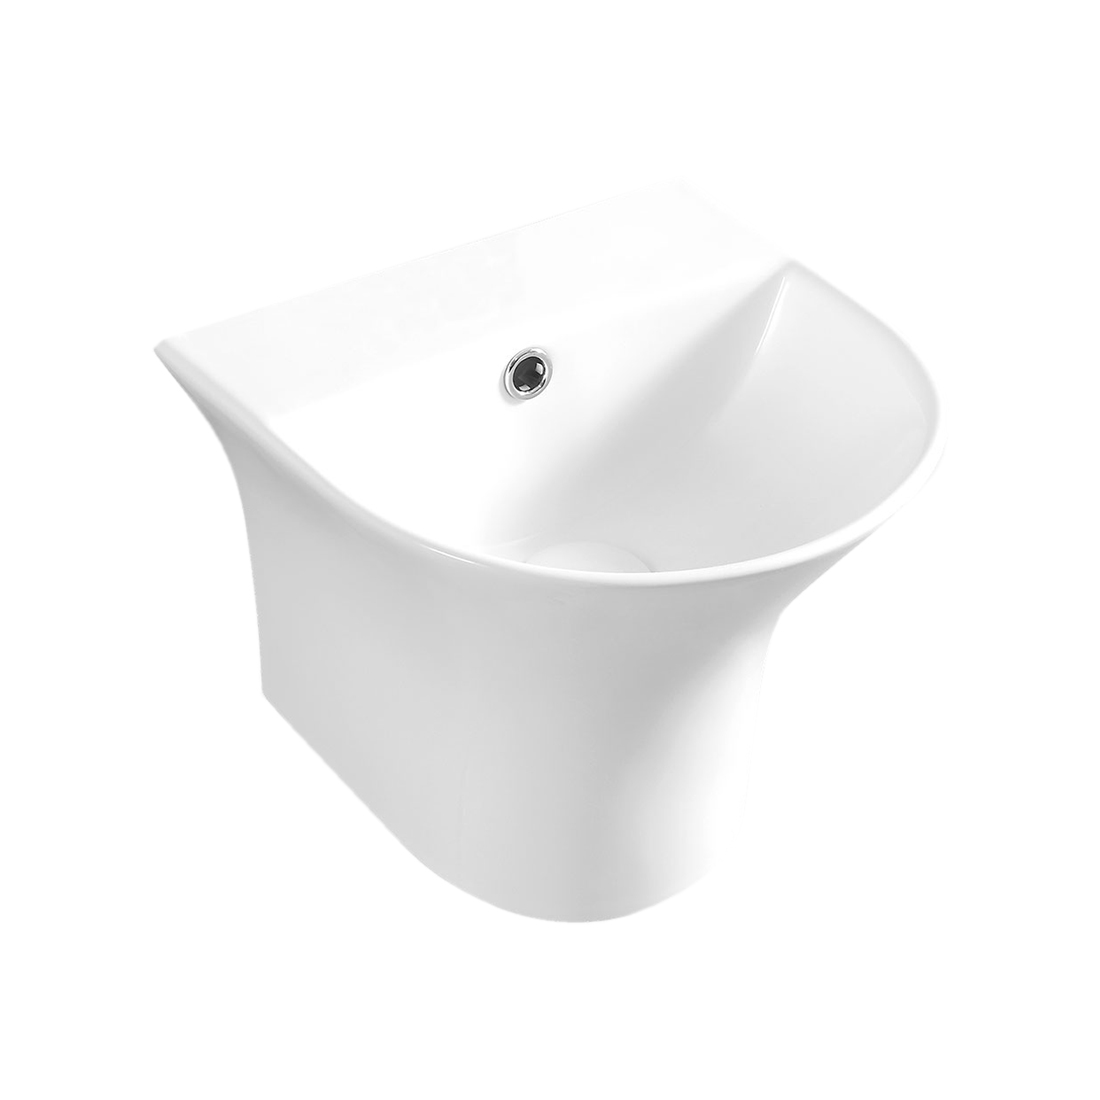 Kerovit Trio KS272 Wash Basin With Integrated Half Pedestal